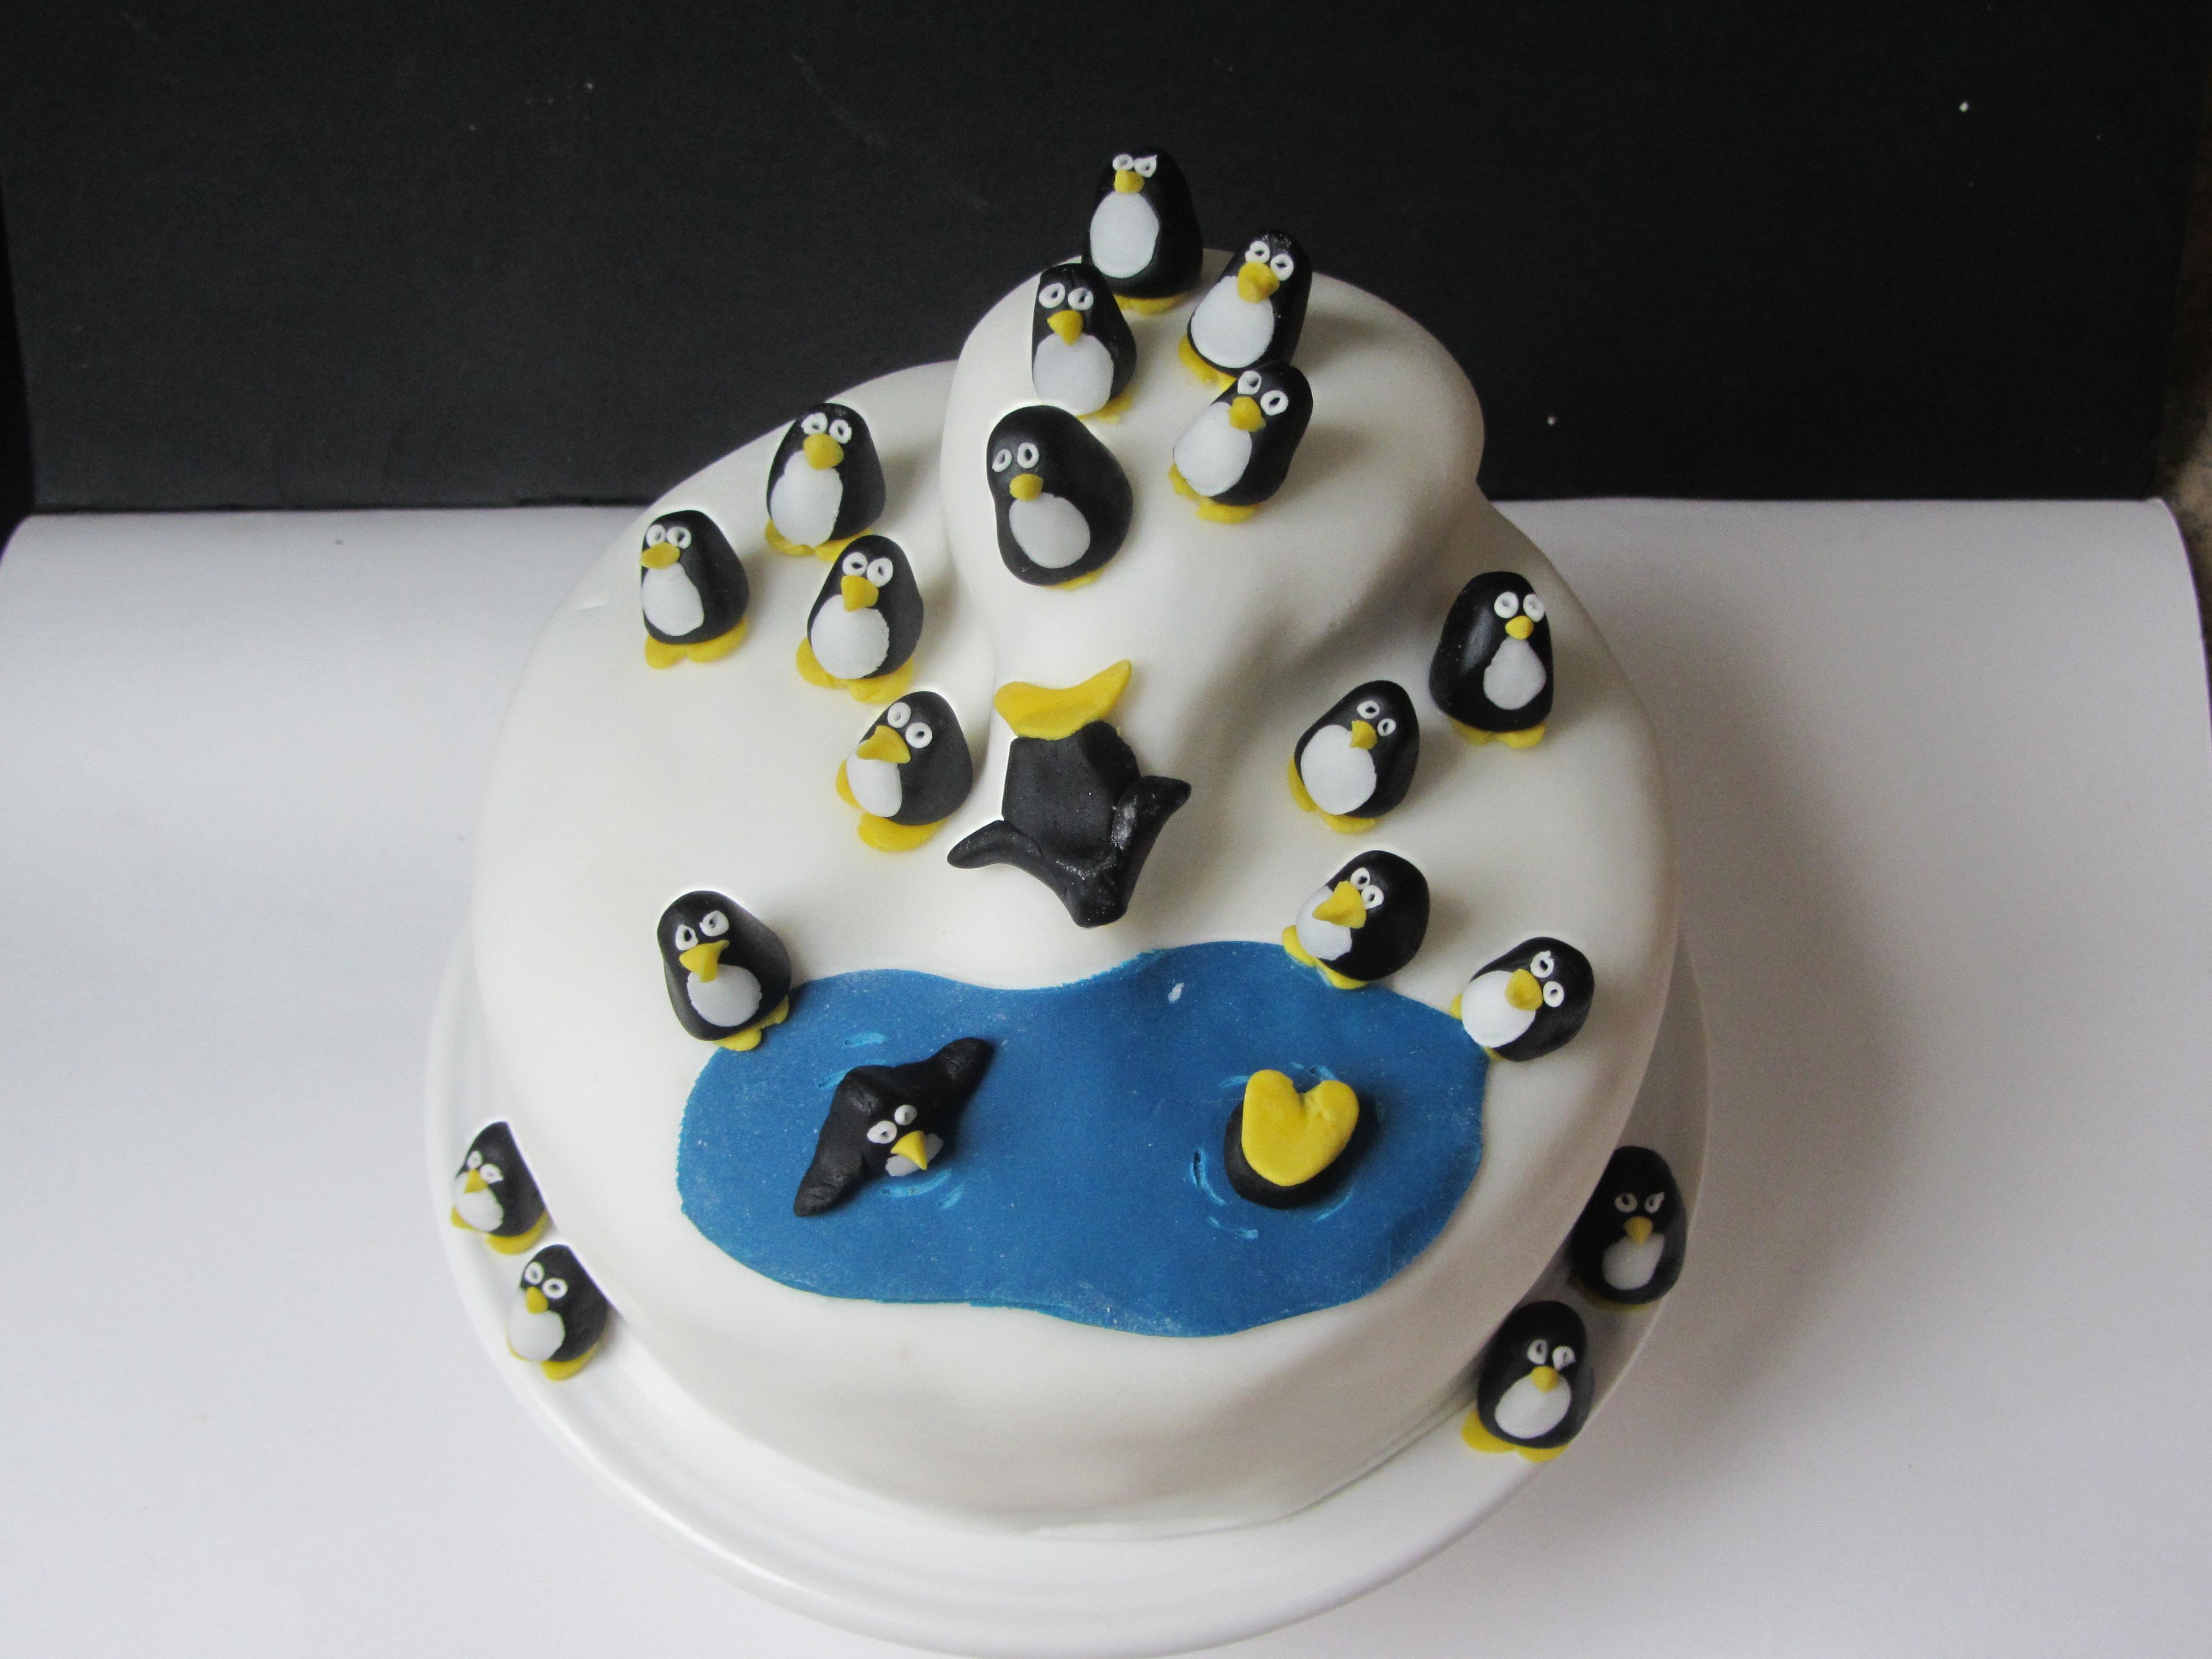 Birthday Cake Ideas Penguin : Penguin Themed Birthday Cake   Lucy s Friendly Foods